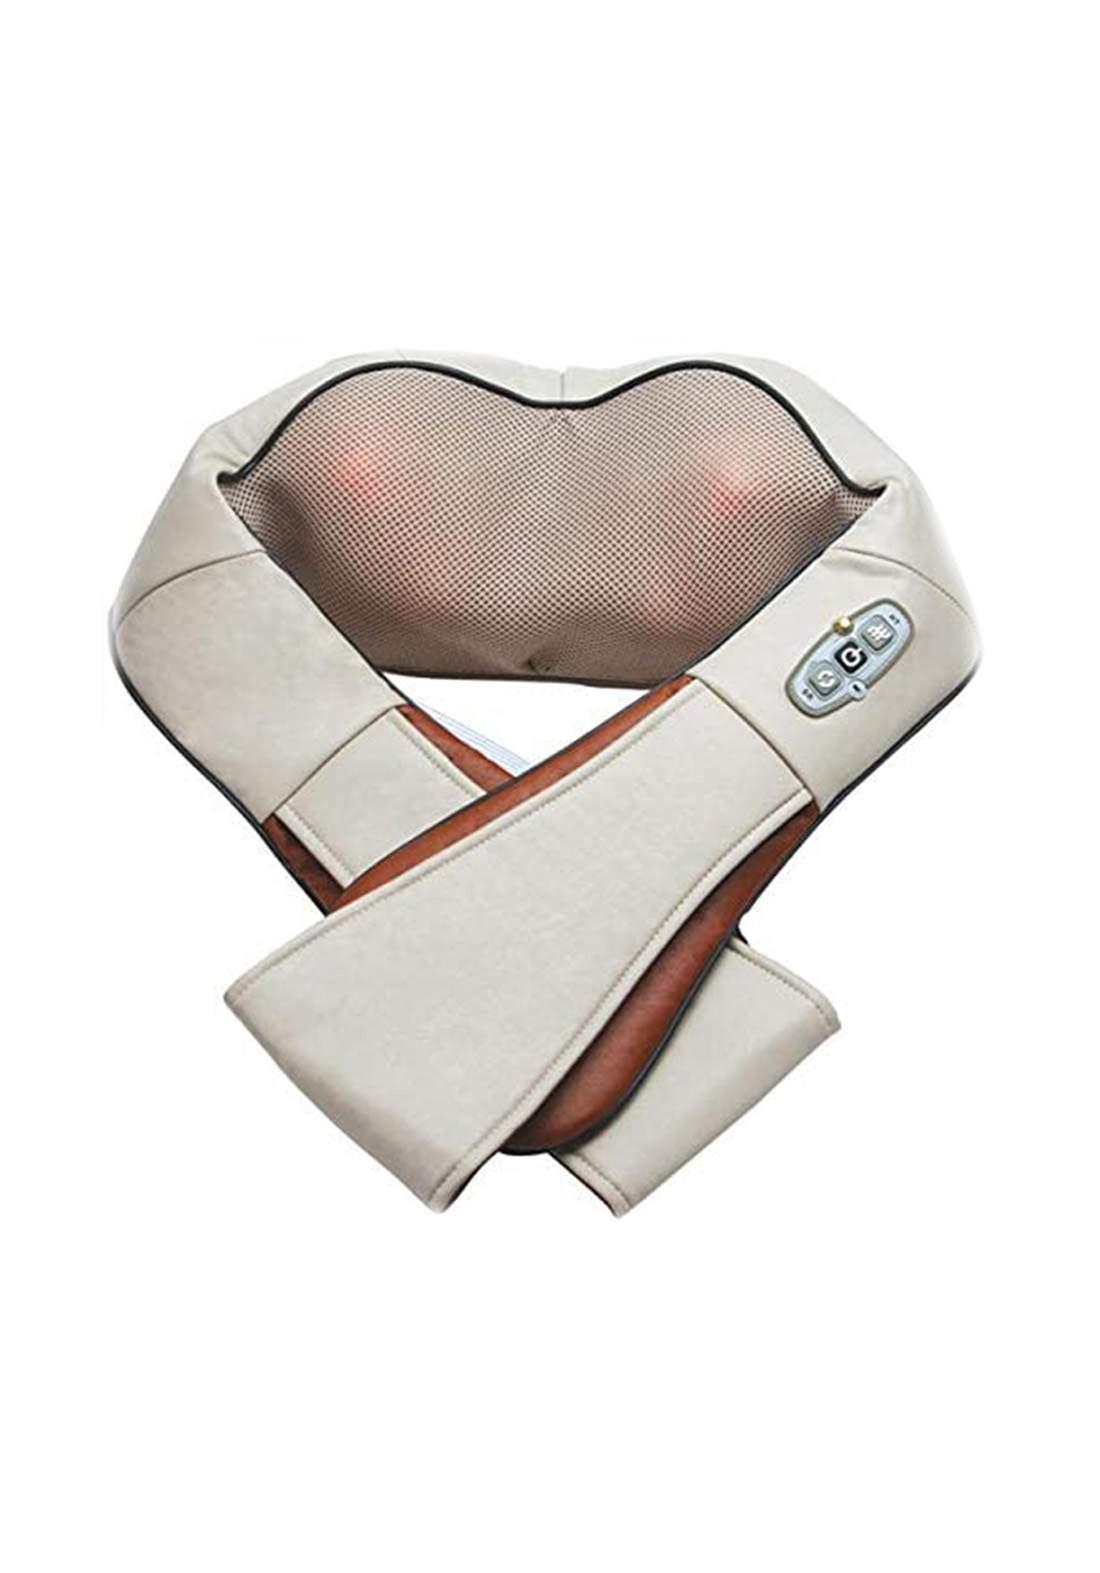 Electrical Shiatsu Massager Neck  جهاز تدليك الرقبة